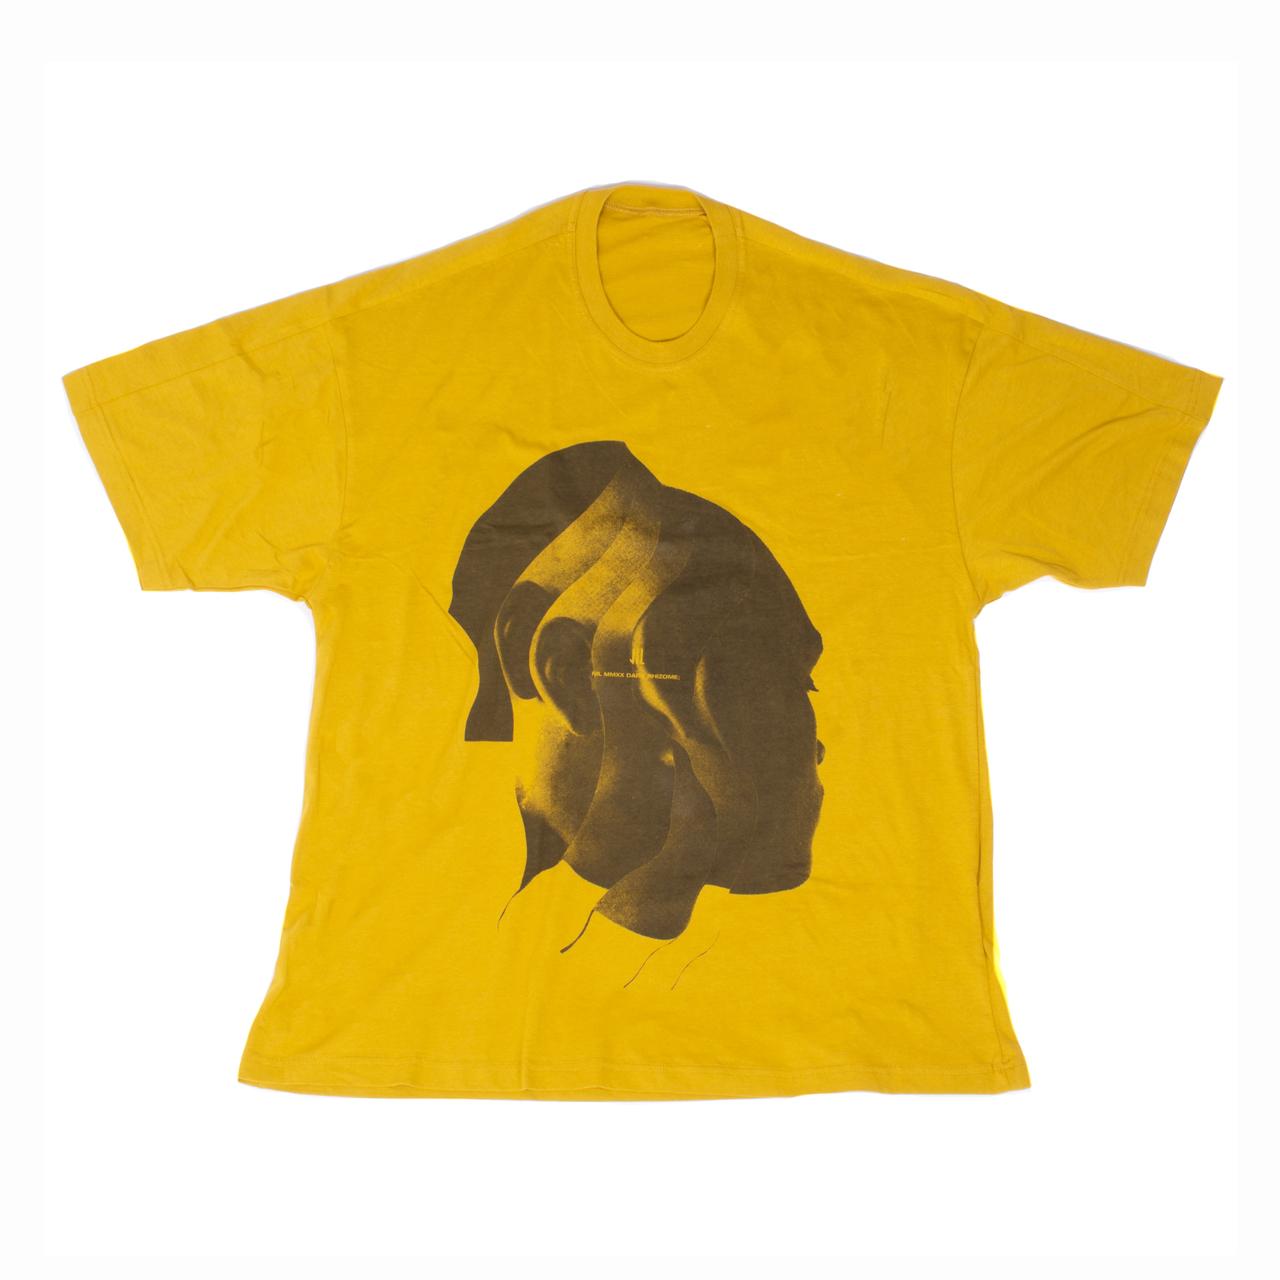 701CPM11-MUSTARD / Jesse Draxler プリント Tシャツ ver.1